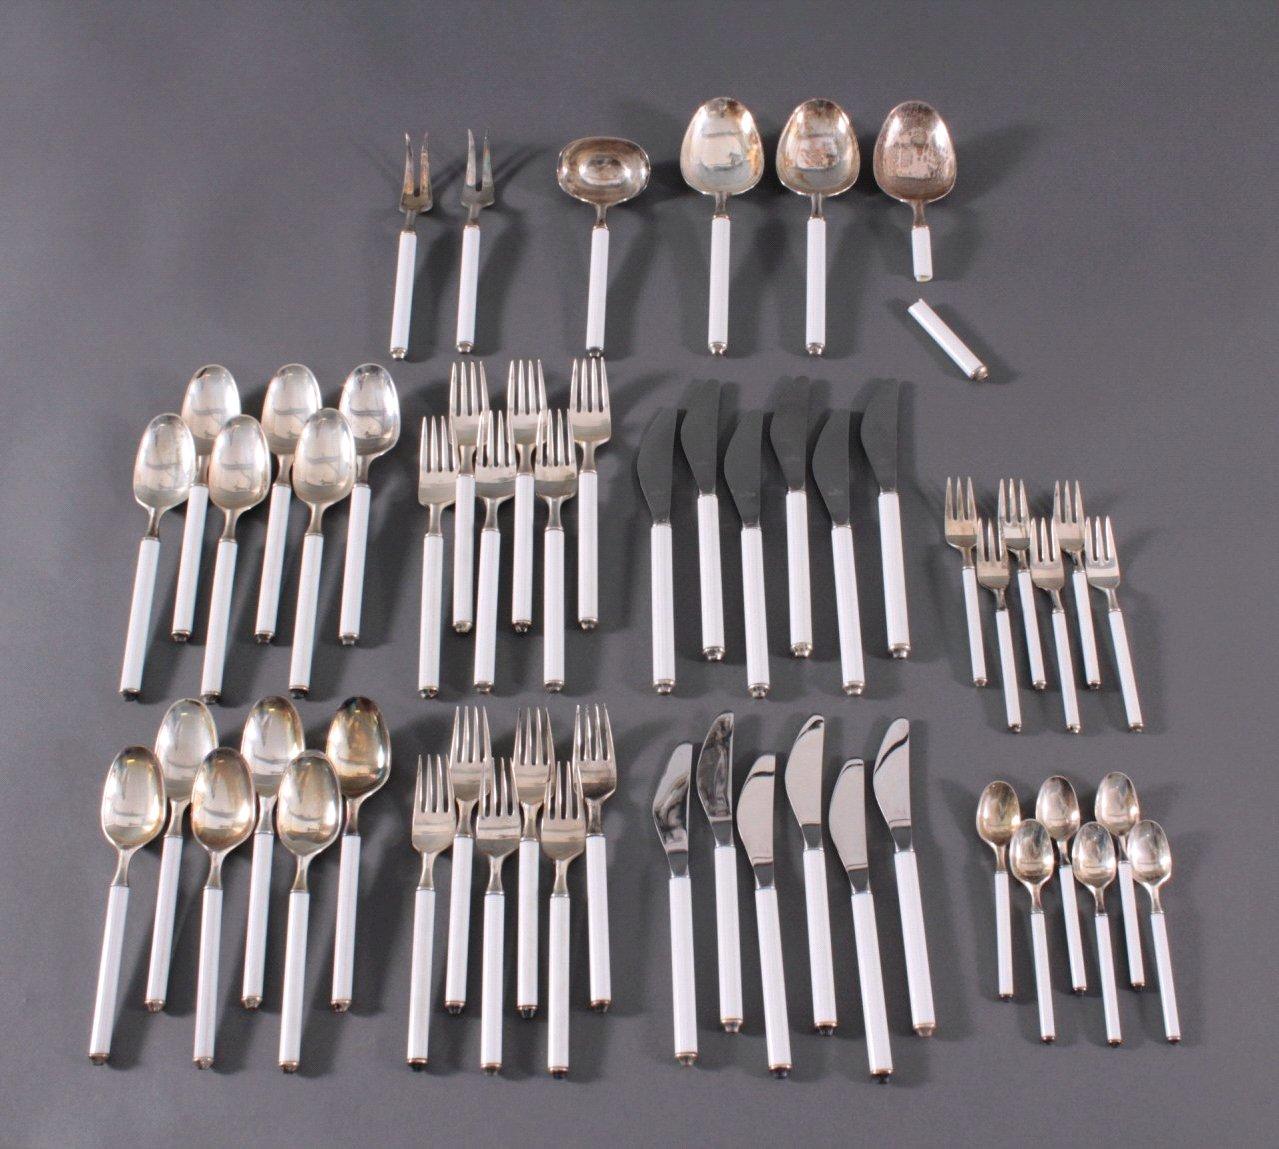 Rosenthal Besteck, Variation/Weiß, 925er Silber